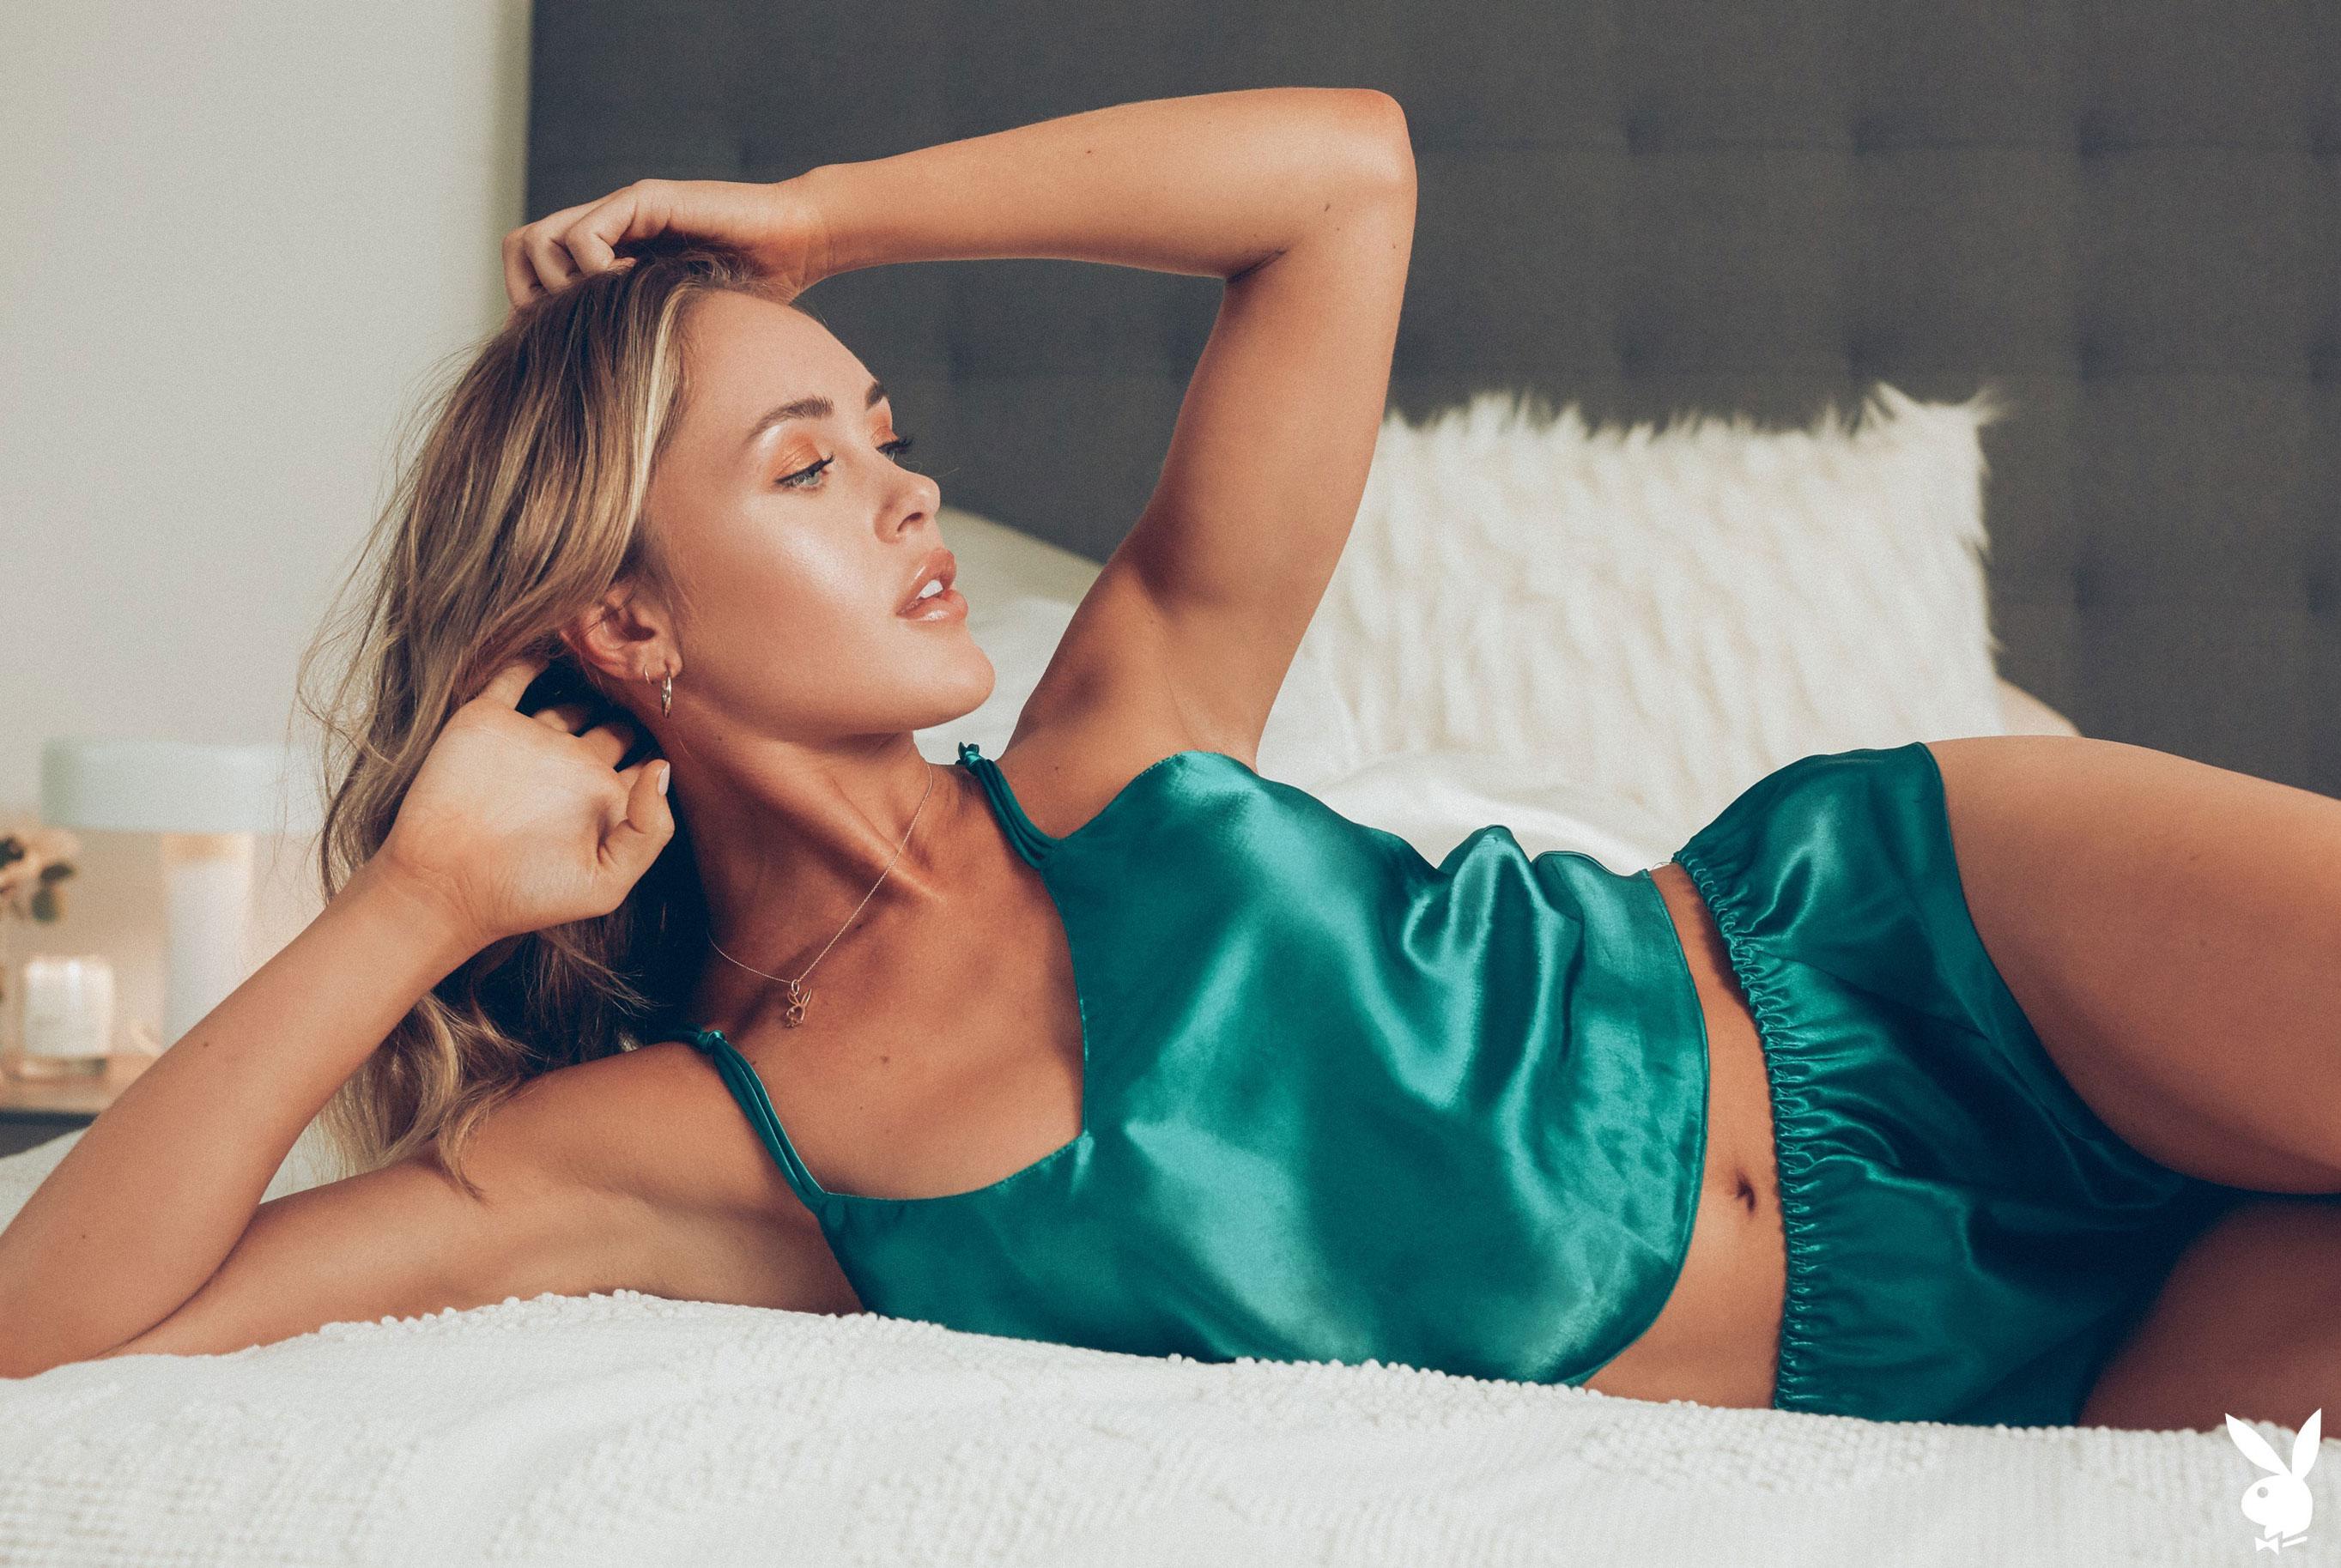 Девушка месяца Эбигейл О'Нил - Playboy США, май 2019 / фото 19